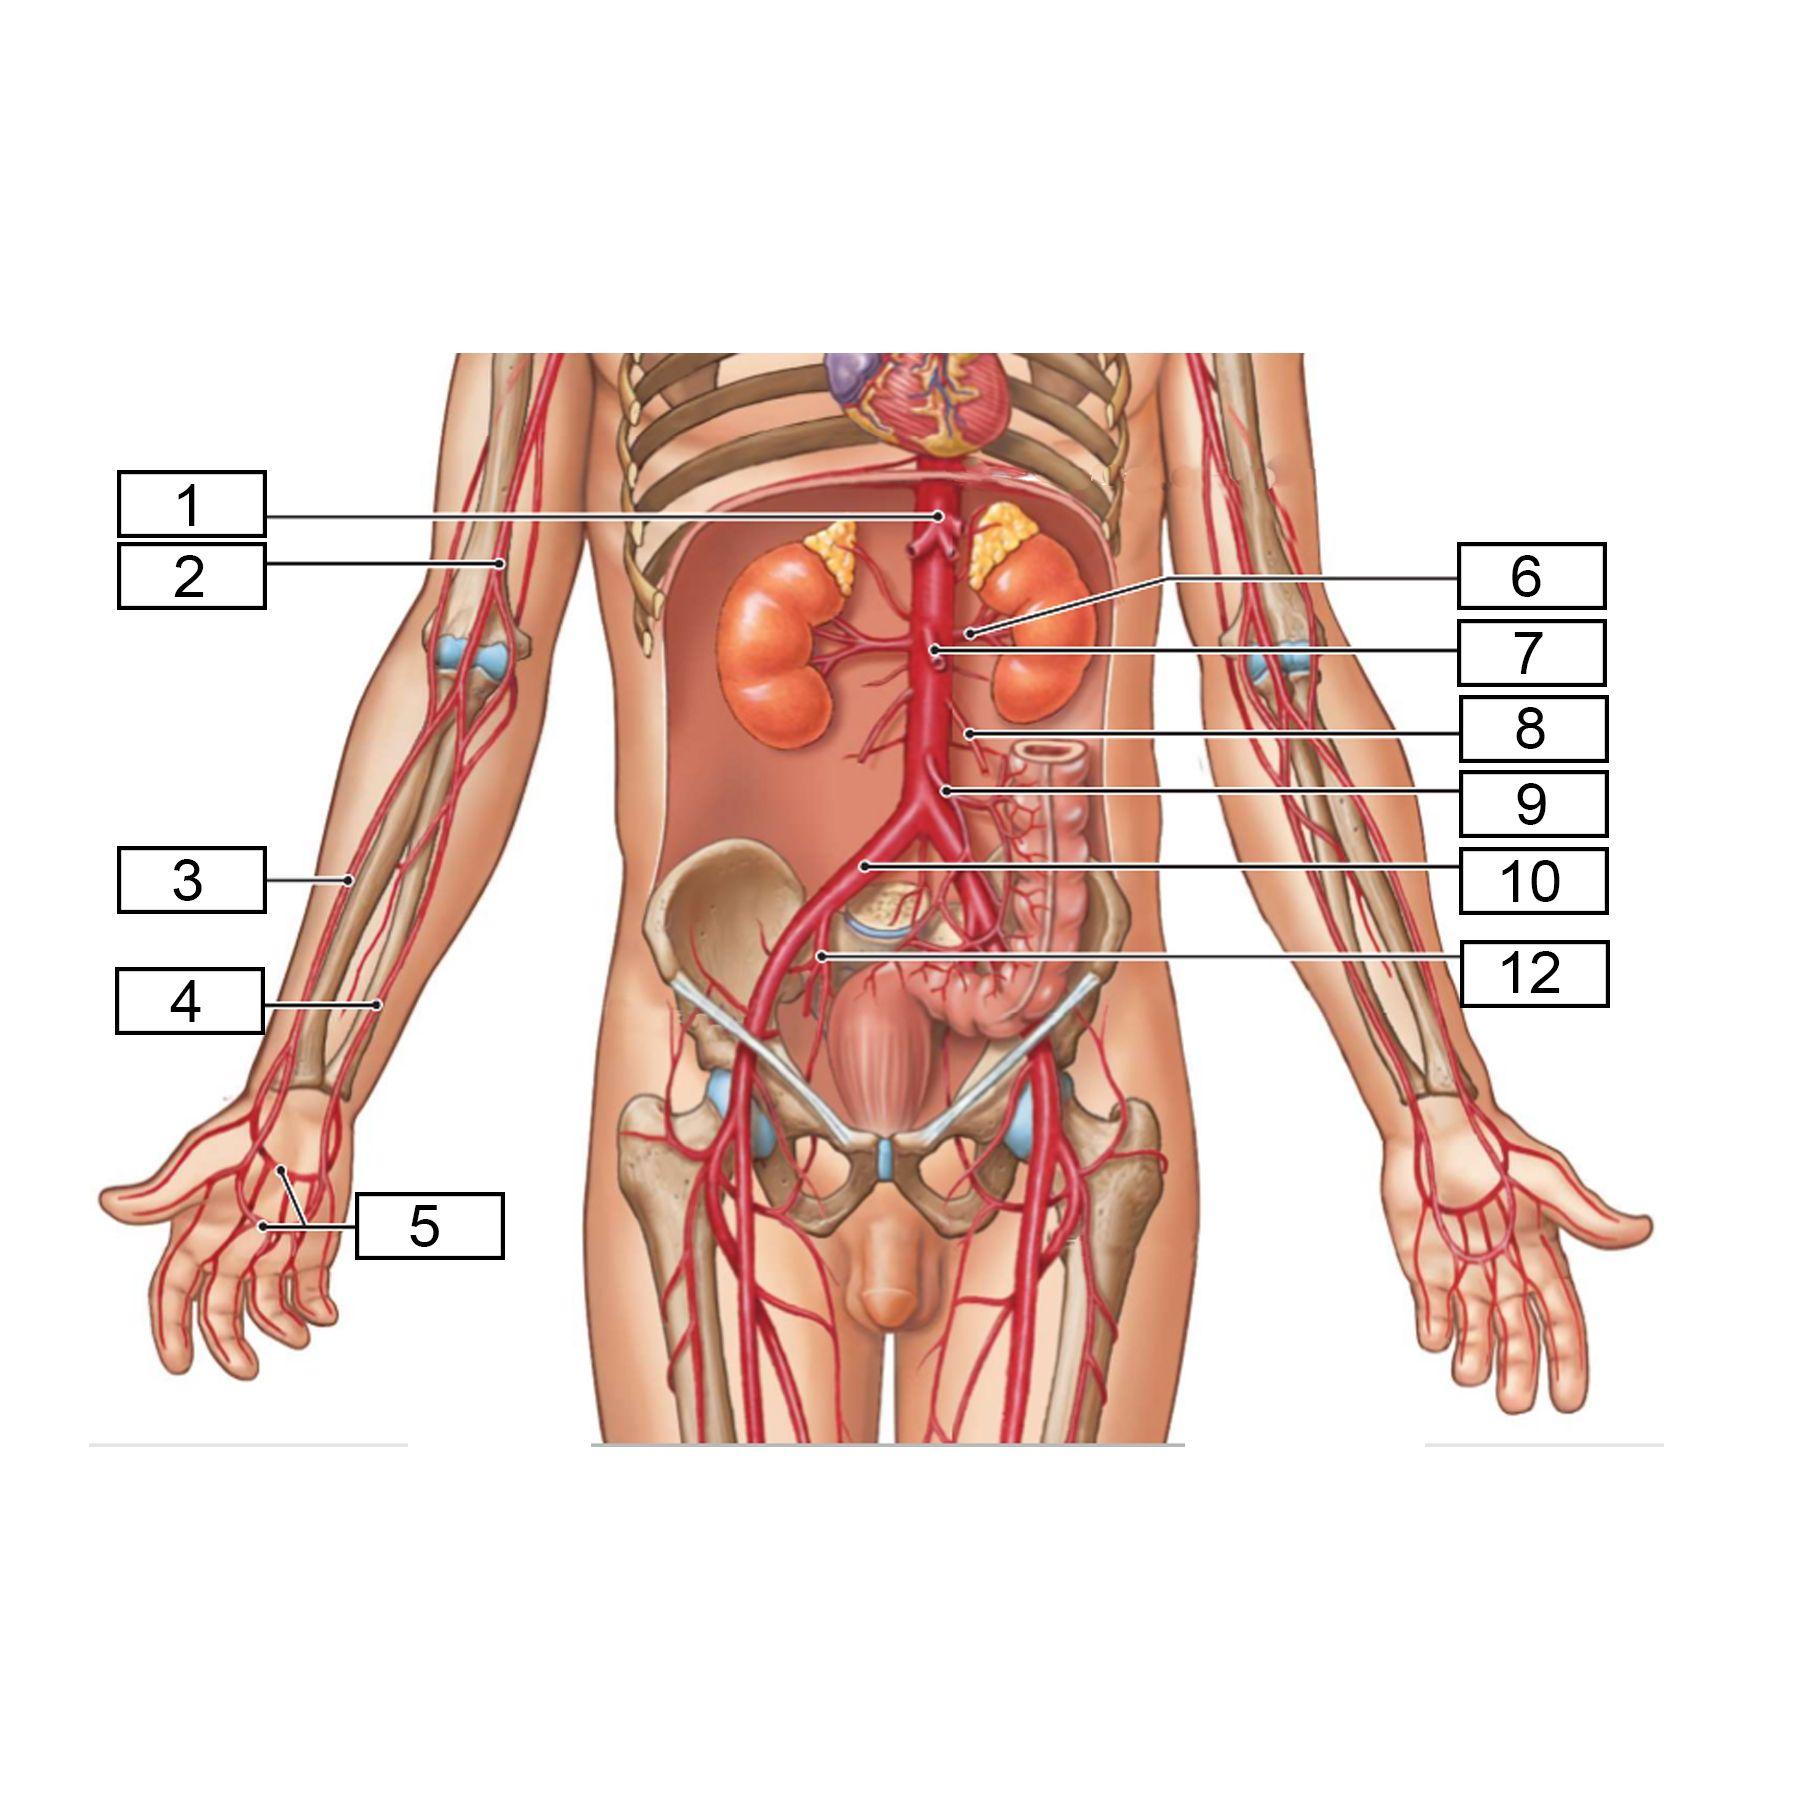 1=arteria iliacus externa 3=arteria tibialis posterior 4=arteria ...